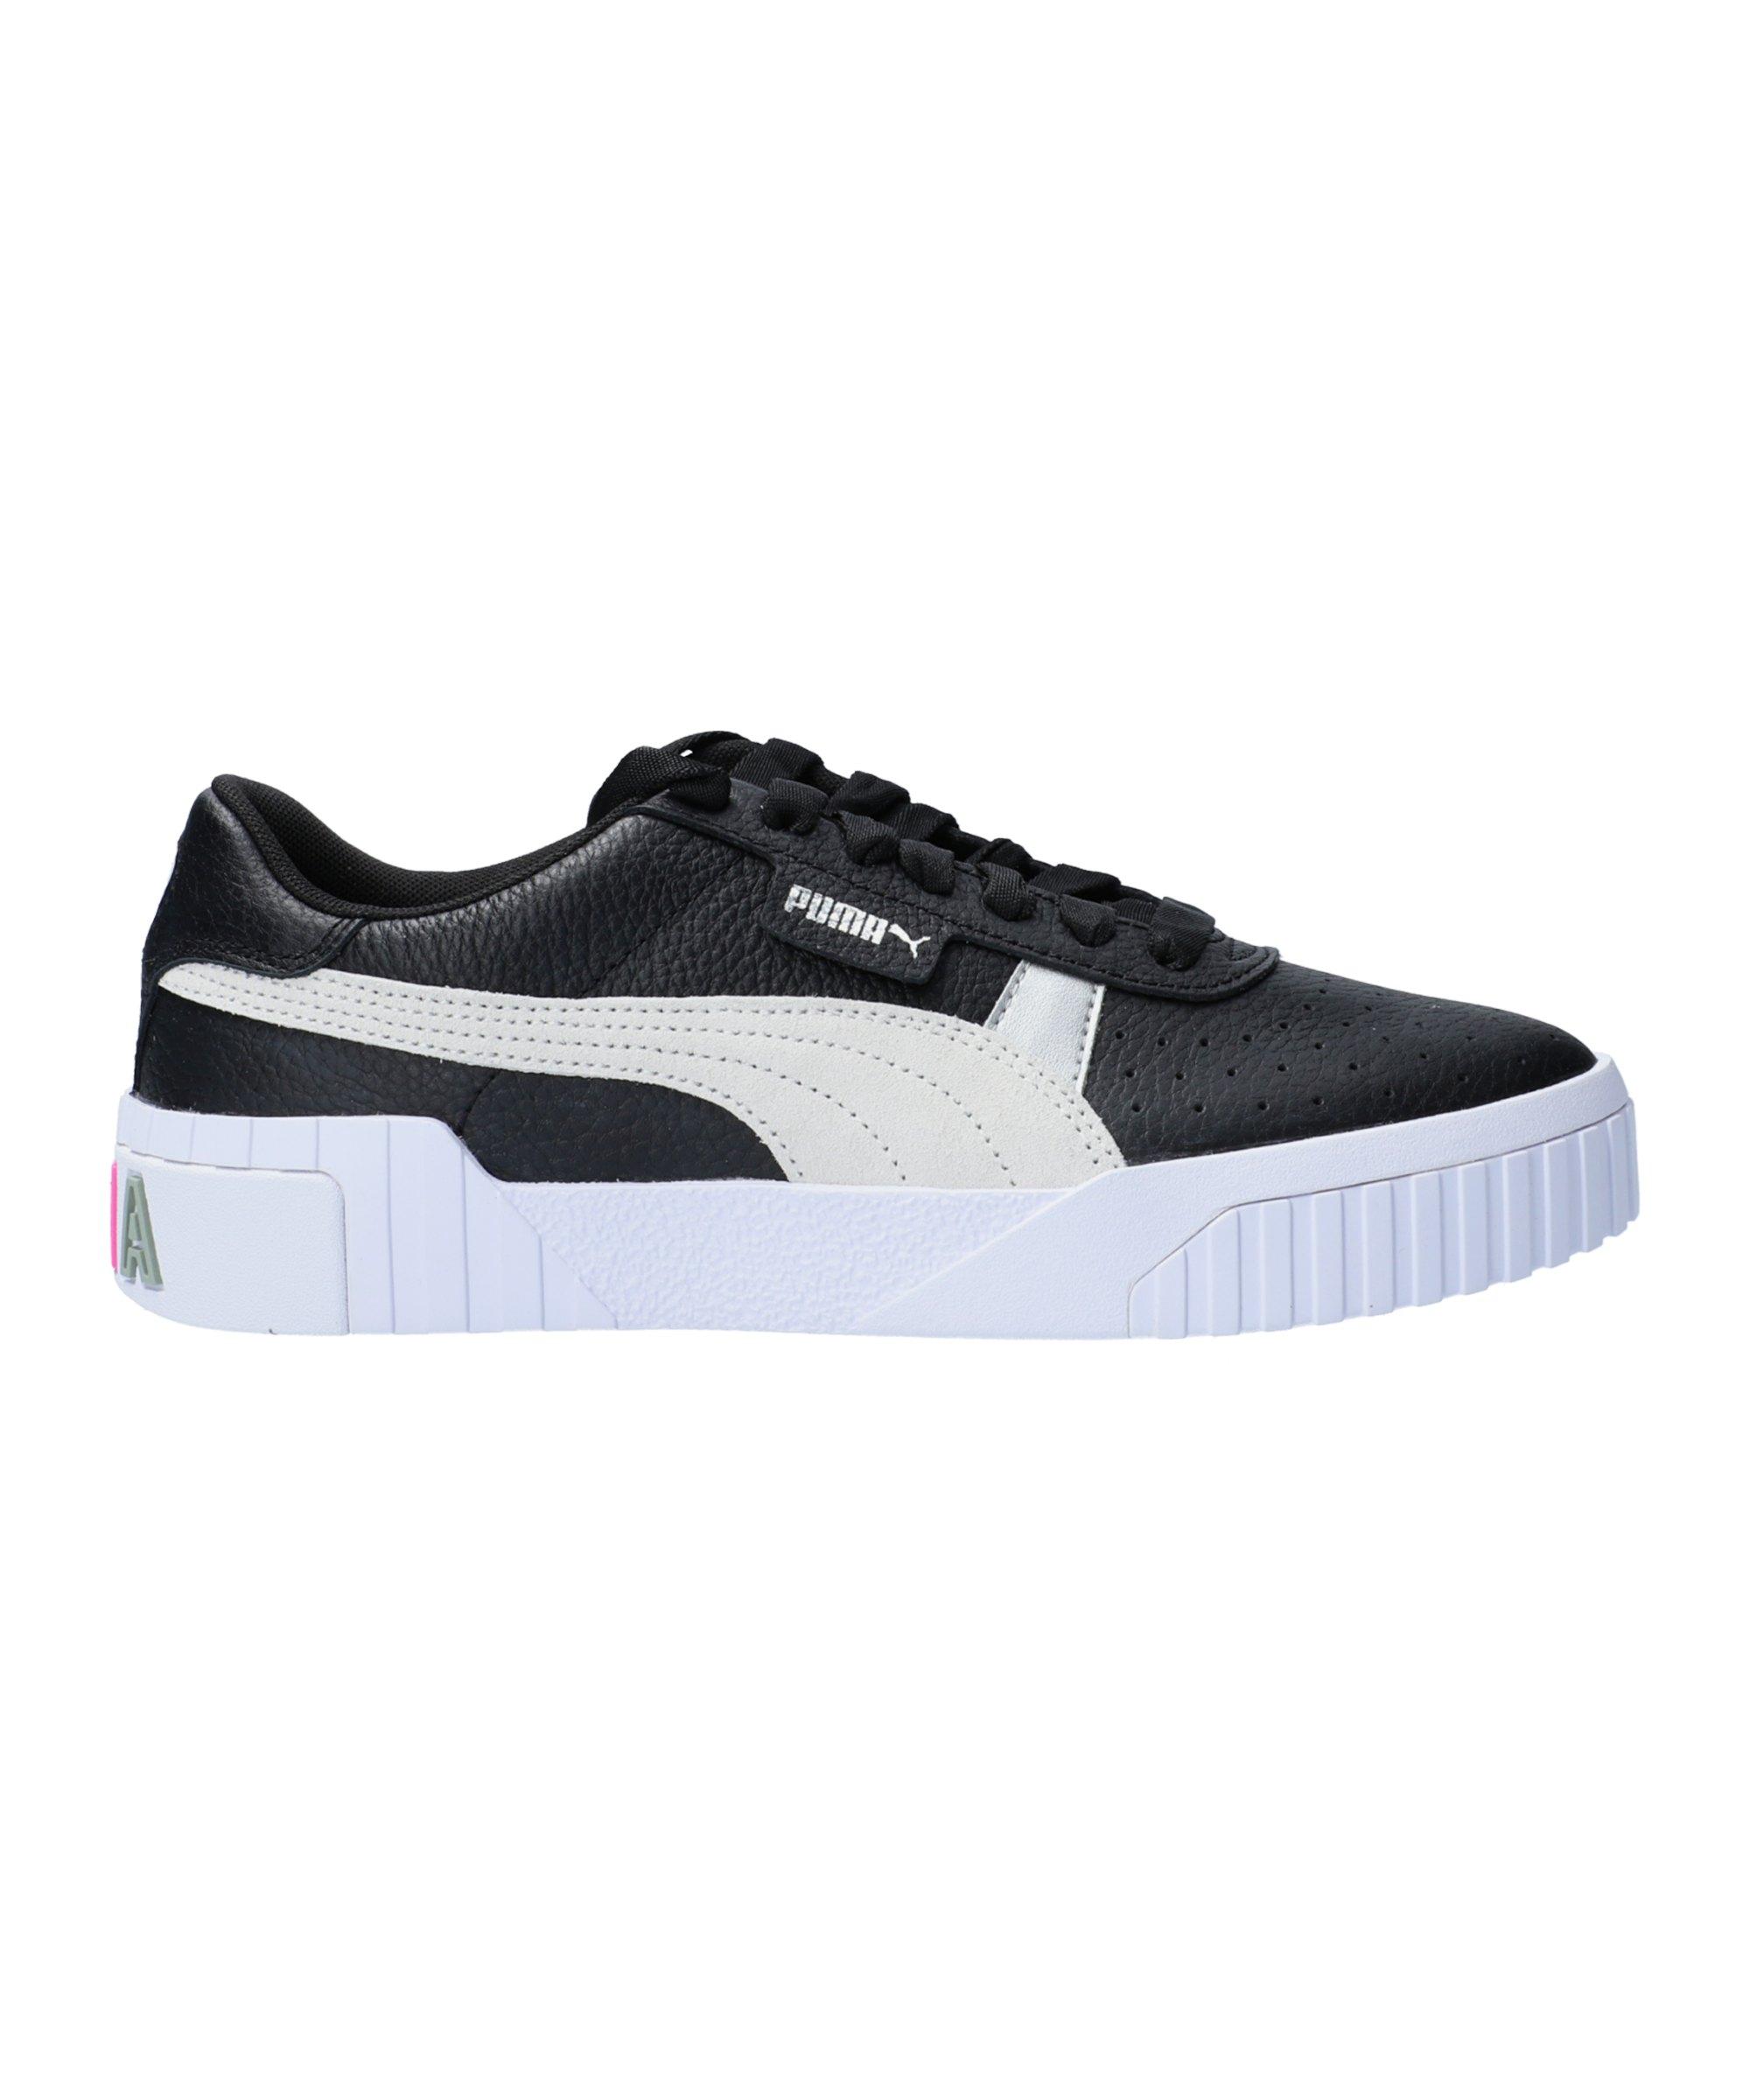 PUMA Cali Varsity Sneaker Damen Schwarz Weiss F02 - schwarz